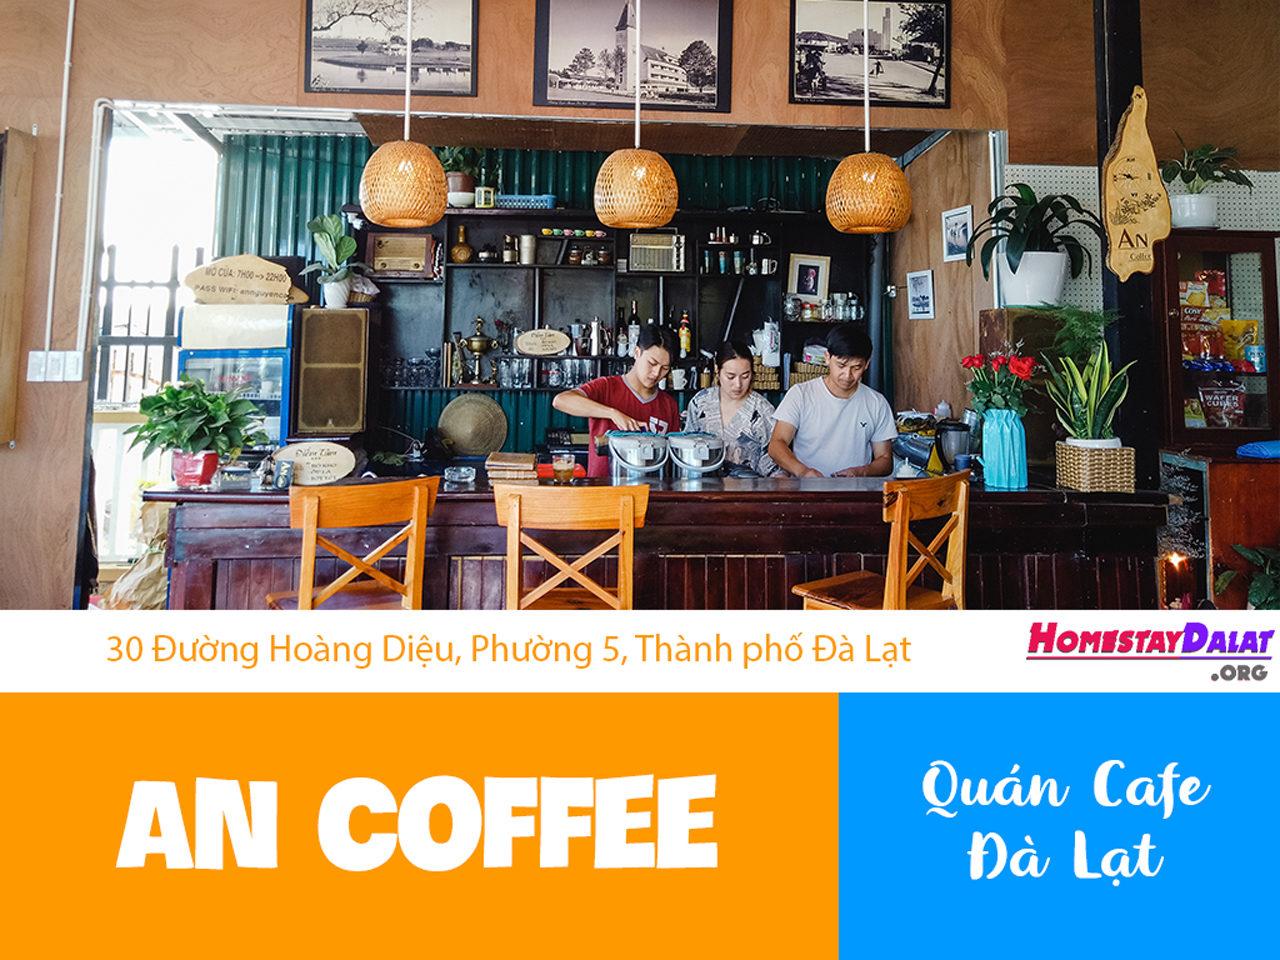 Giới thiệu An Coffee Hoàng Diệu